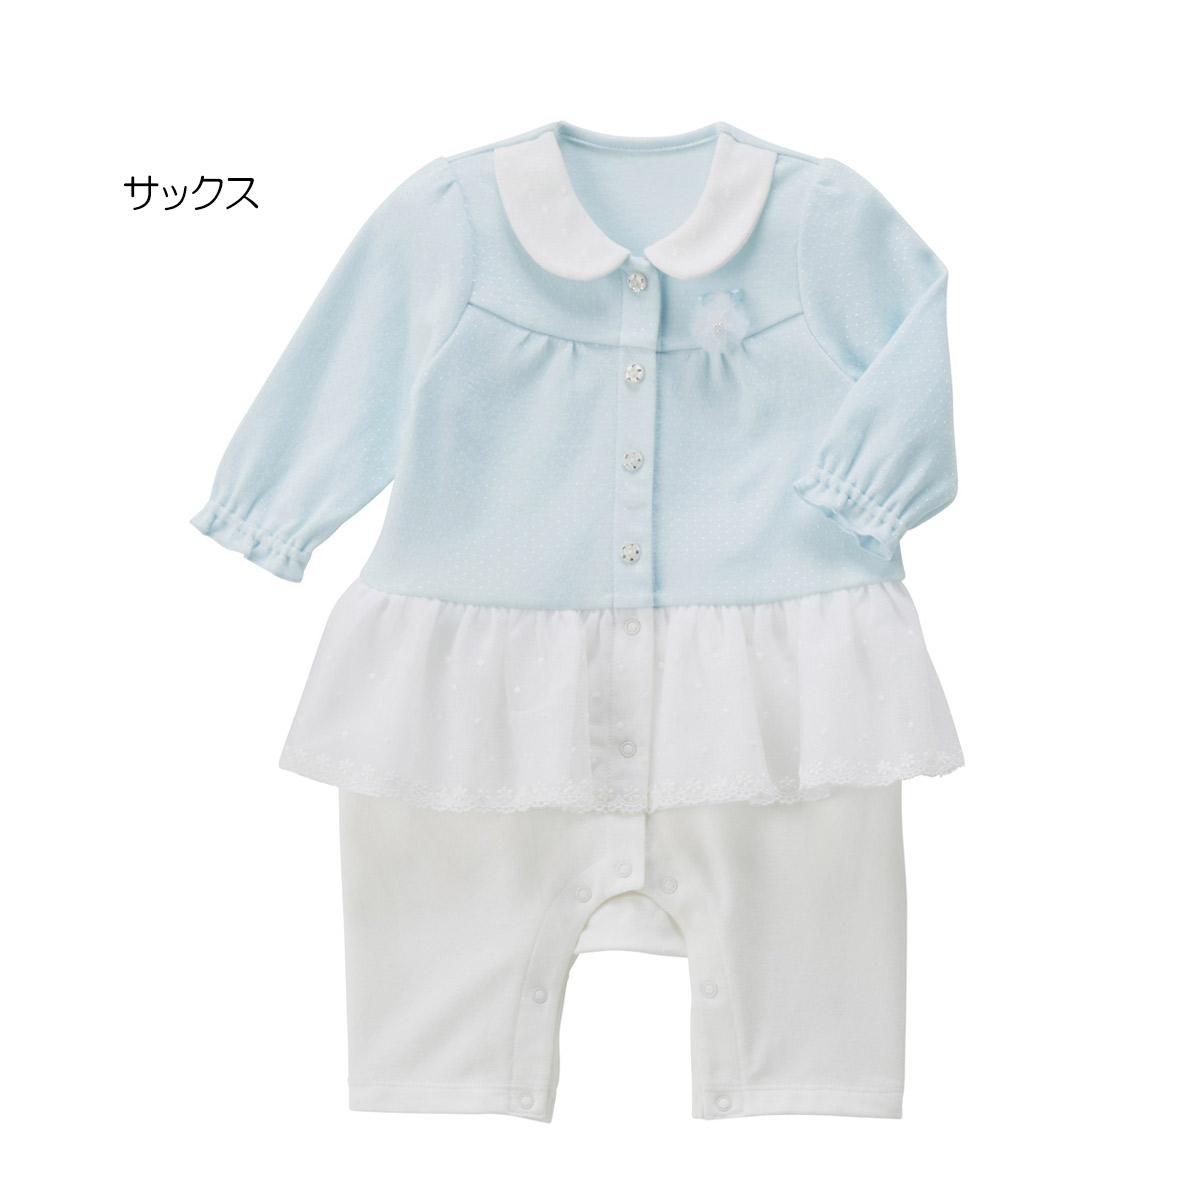 ca41d3ed059a4 mikihouse ダブルビー 子供服ミキハウス mikihouse 女の子用フォーマル ...